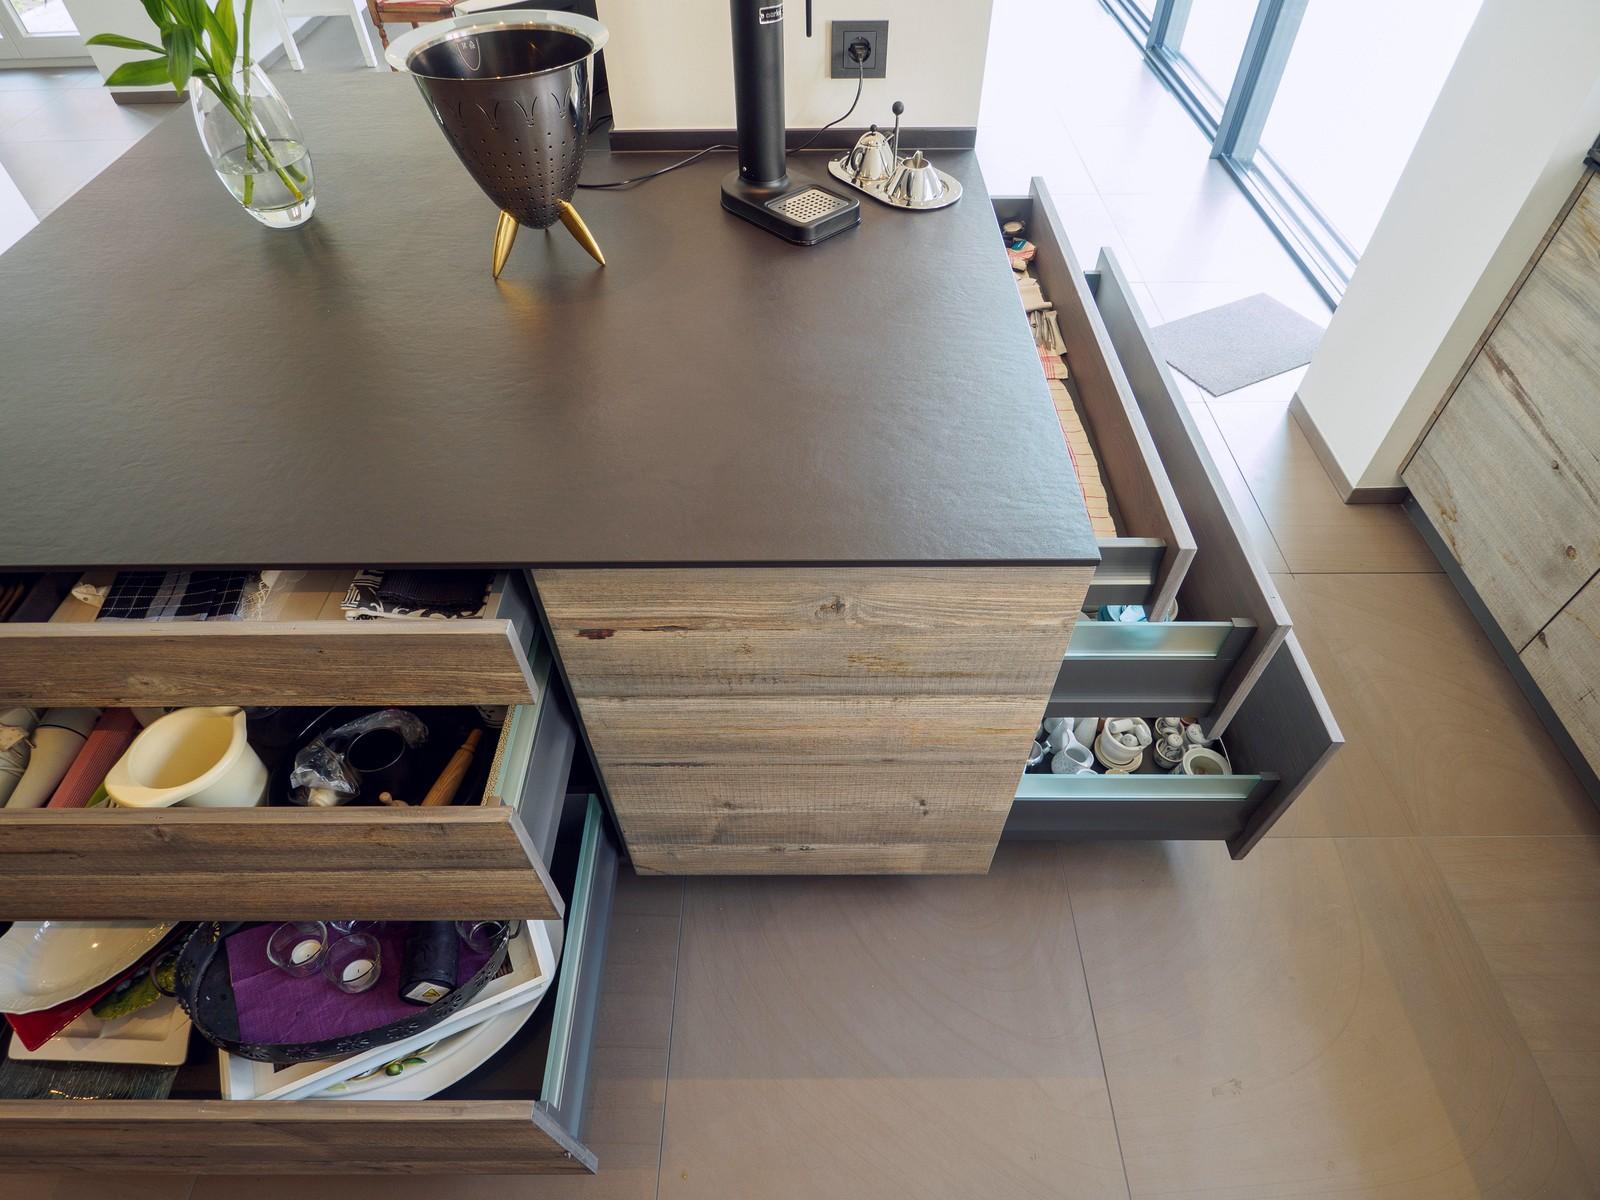 Kueche Exklusiv Design Fronten Holz Furnier Sonnenverbrannt Stahl Keramik Arbeitsplatte Miele 39